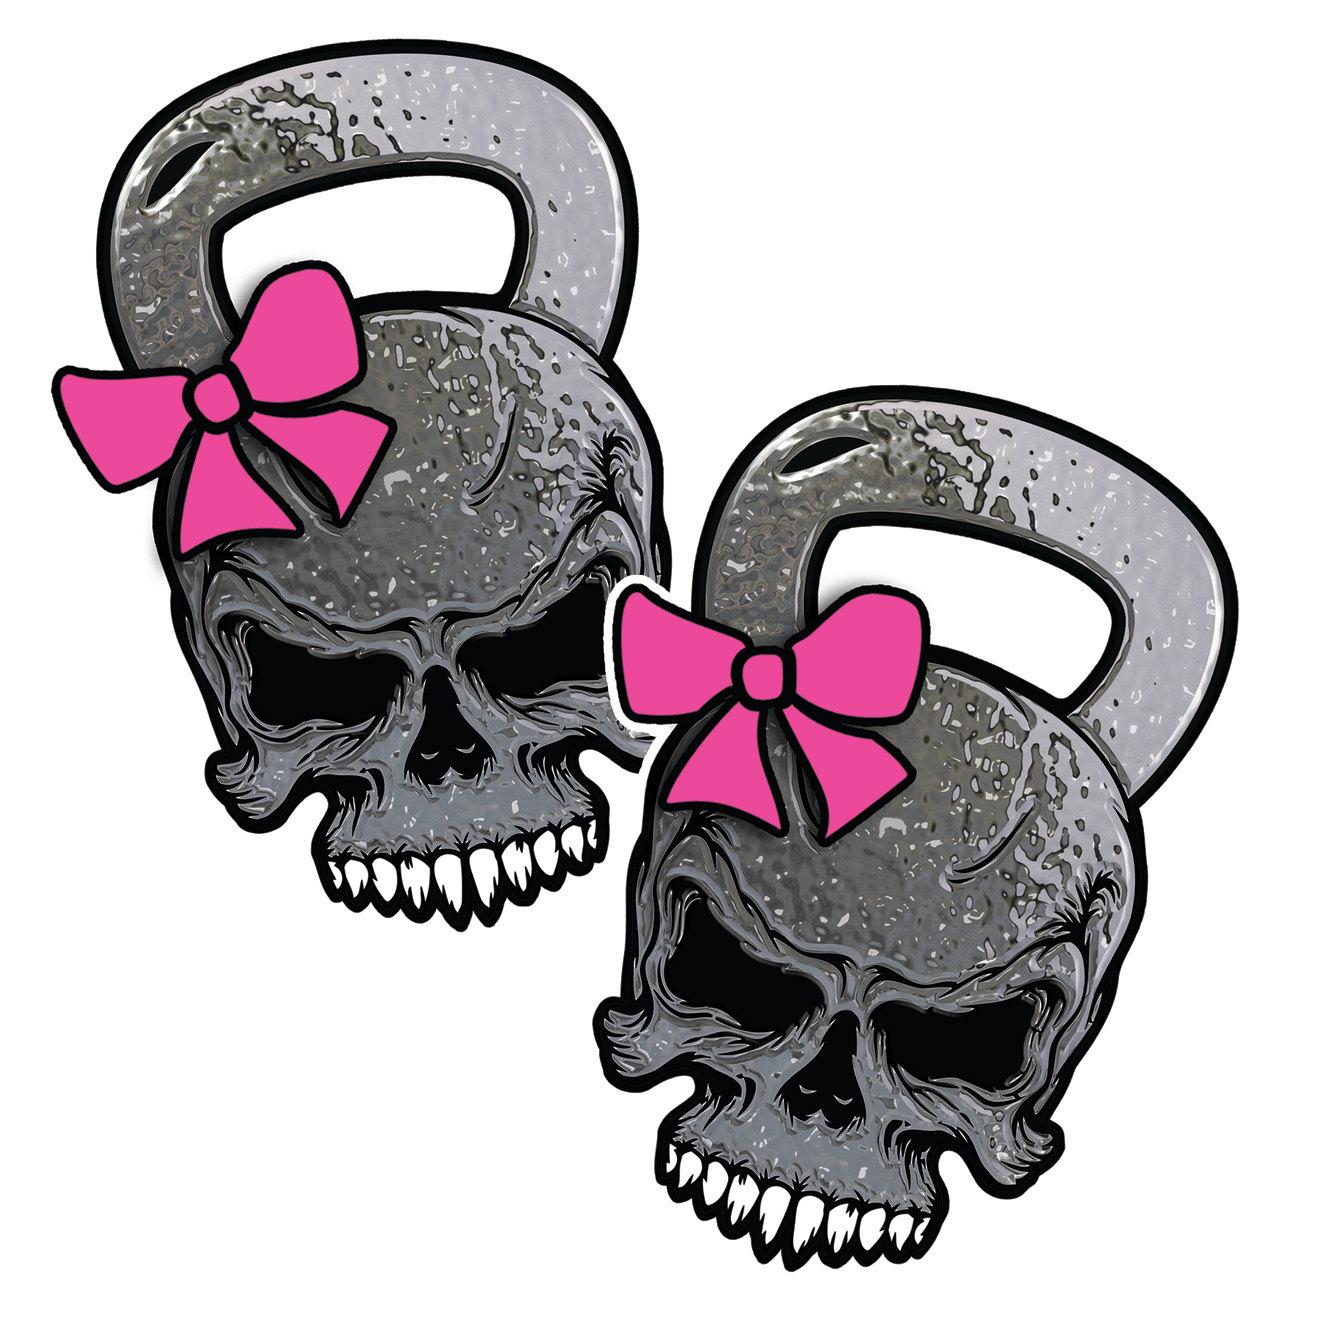 Similiar Skull Shaped Kettlebells Keywords.